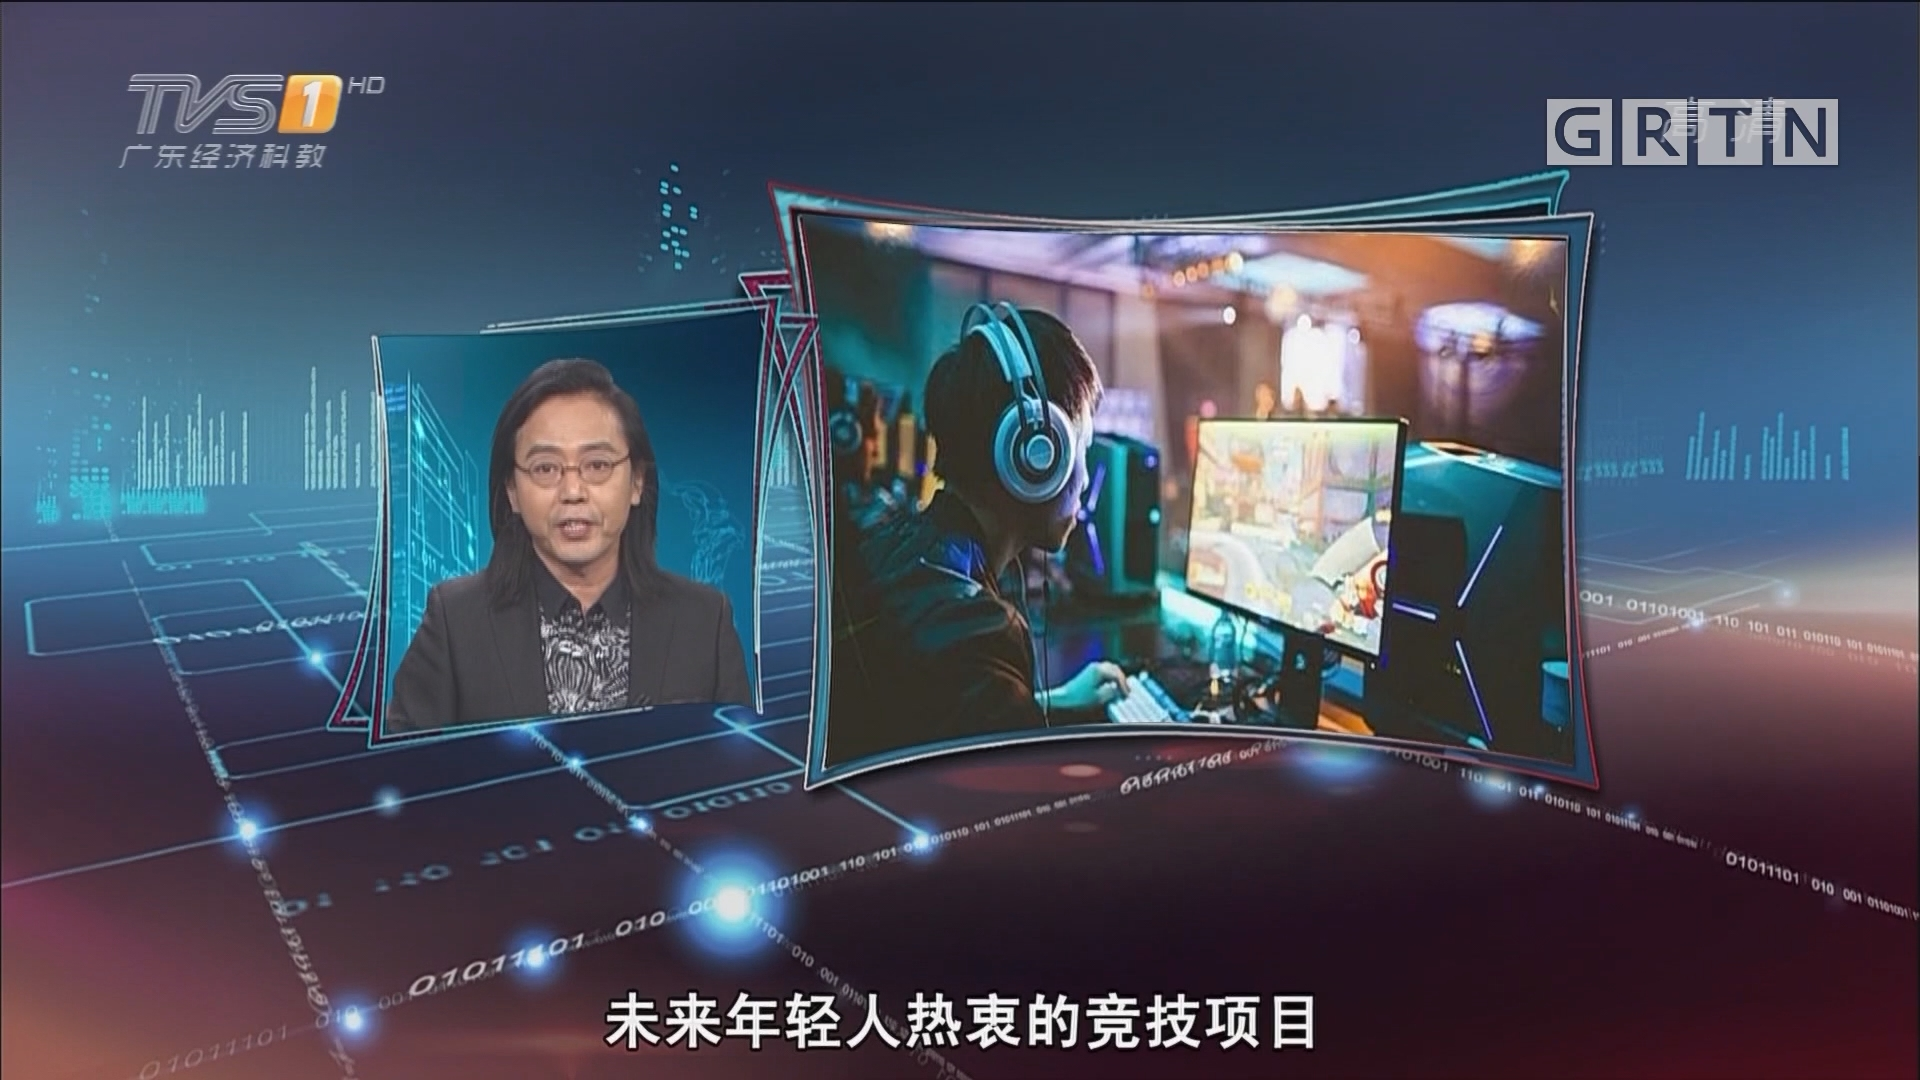 [HD][2018-11-09]马后炮:为电竞正名 但别当成沉迷网游的挡箭牌